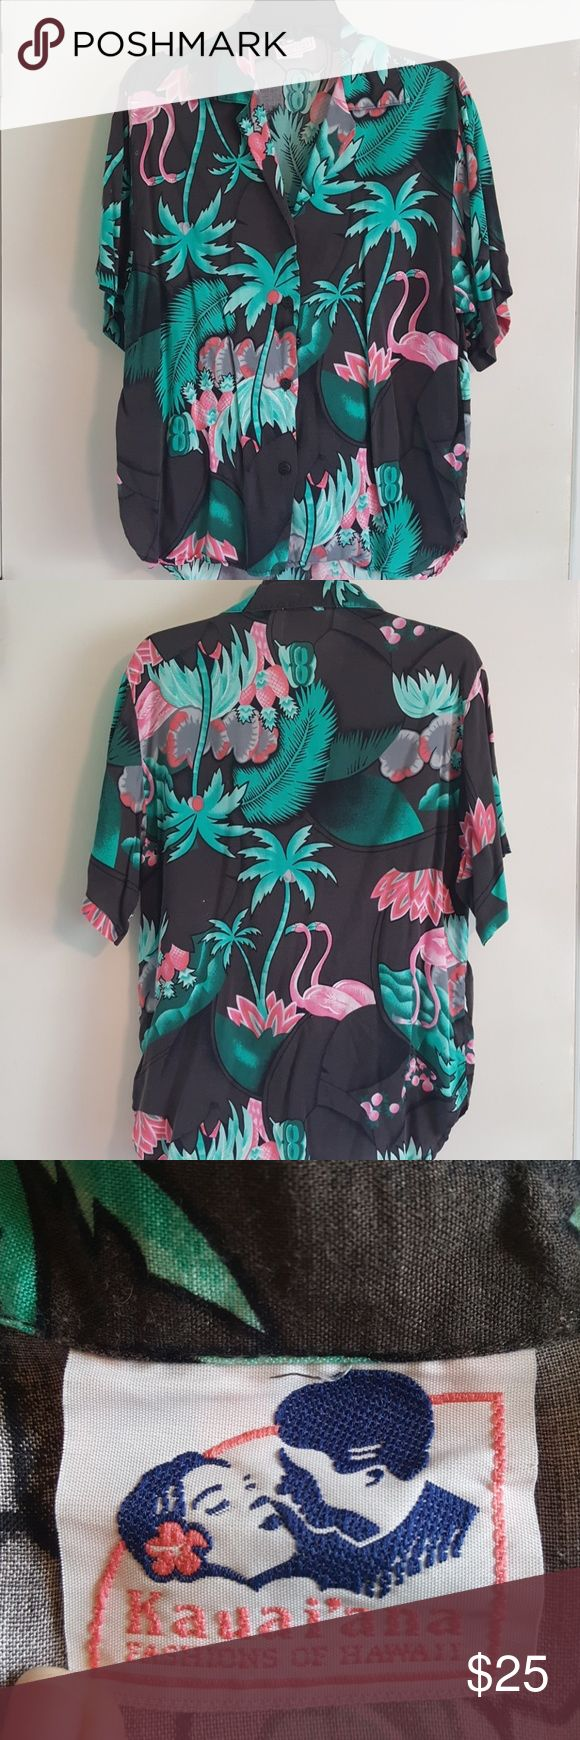 Vintage Hawaiian shirt This vintage Hawaiian shirt sports green palm trees and pink flamingos. It is comfortable and perfect for summer and spring. Kauai'ana Shirts Casual Button Down Shirts